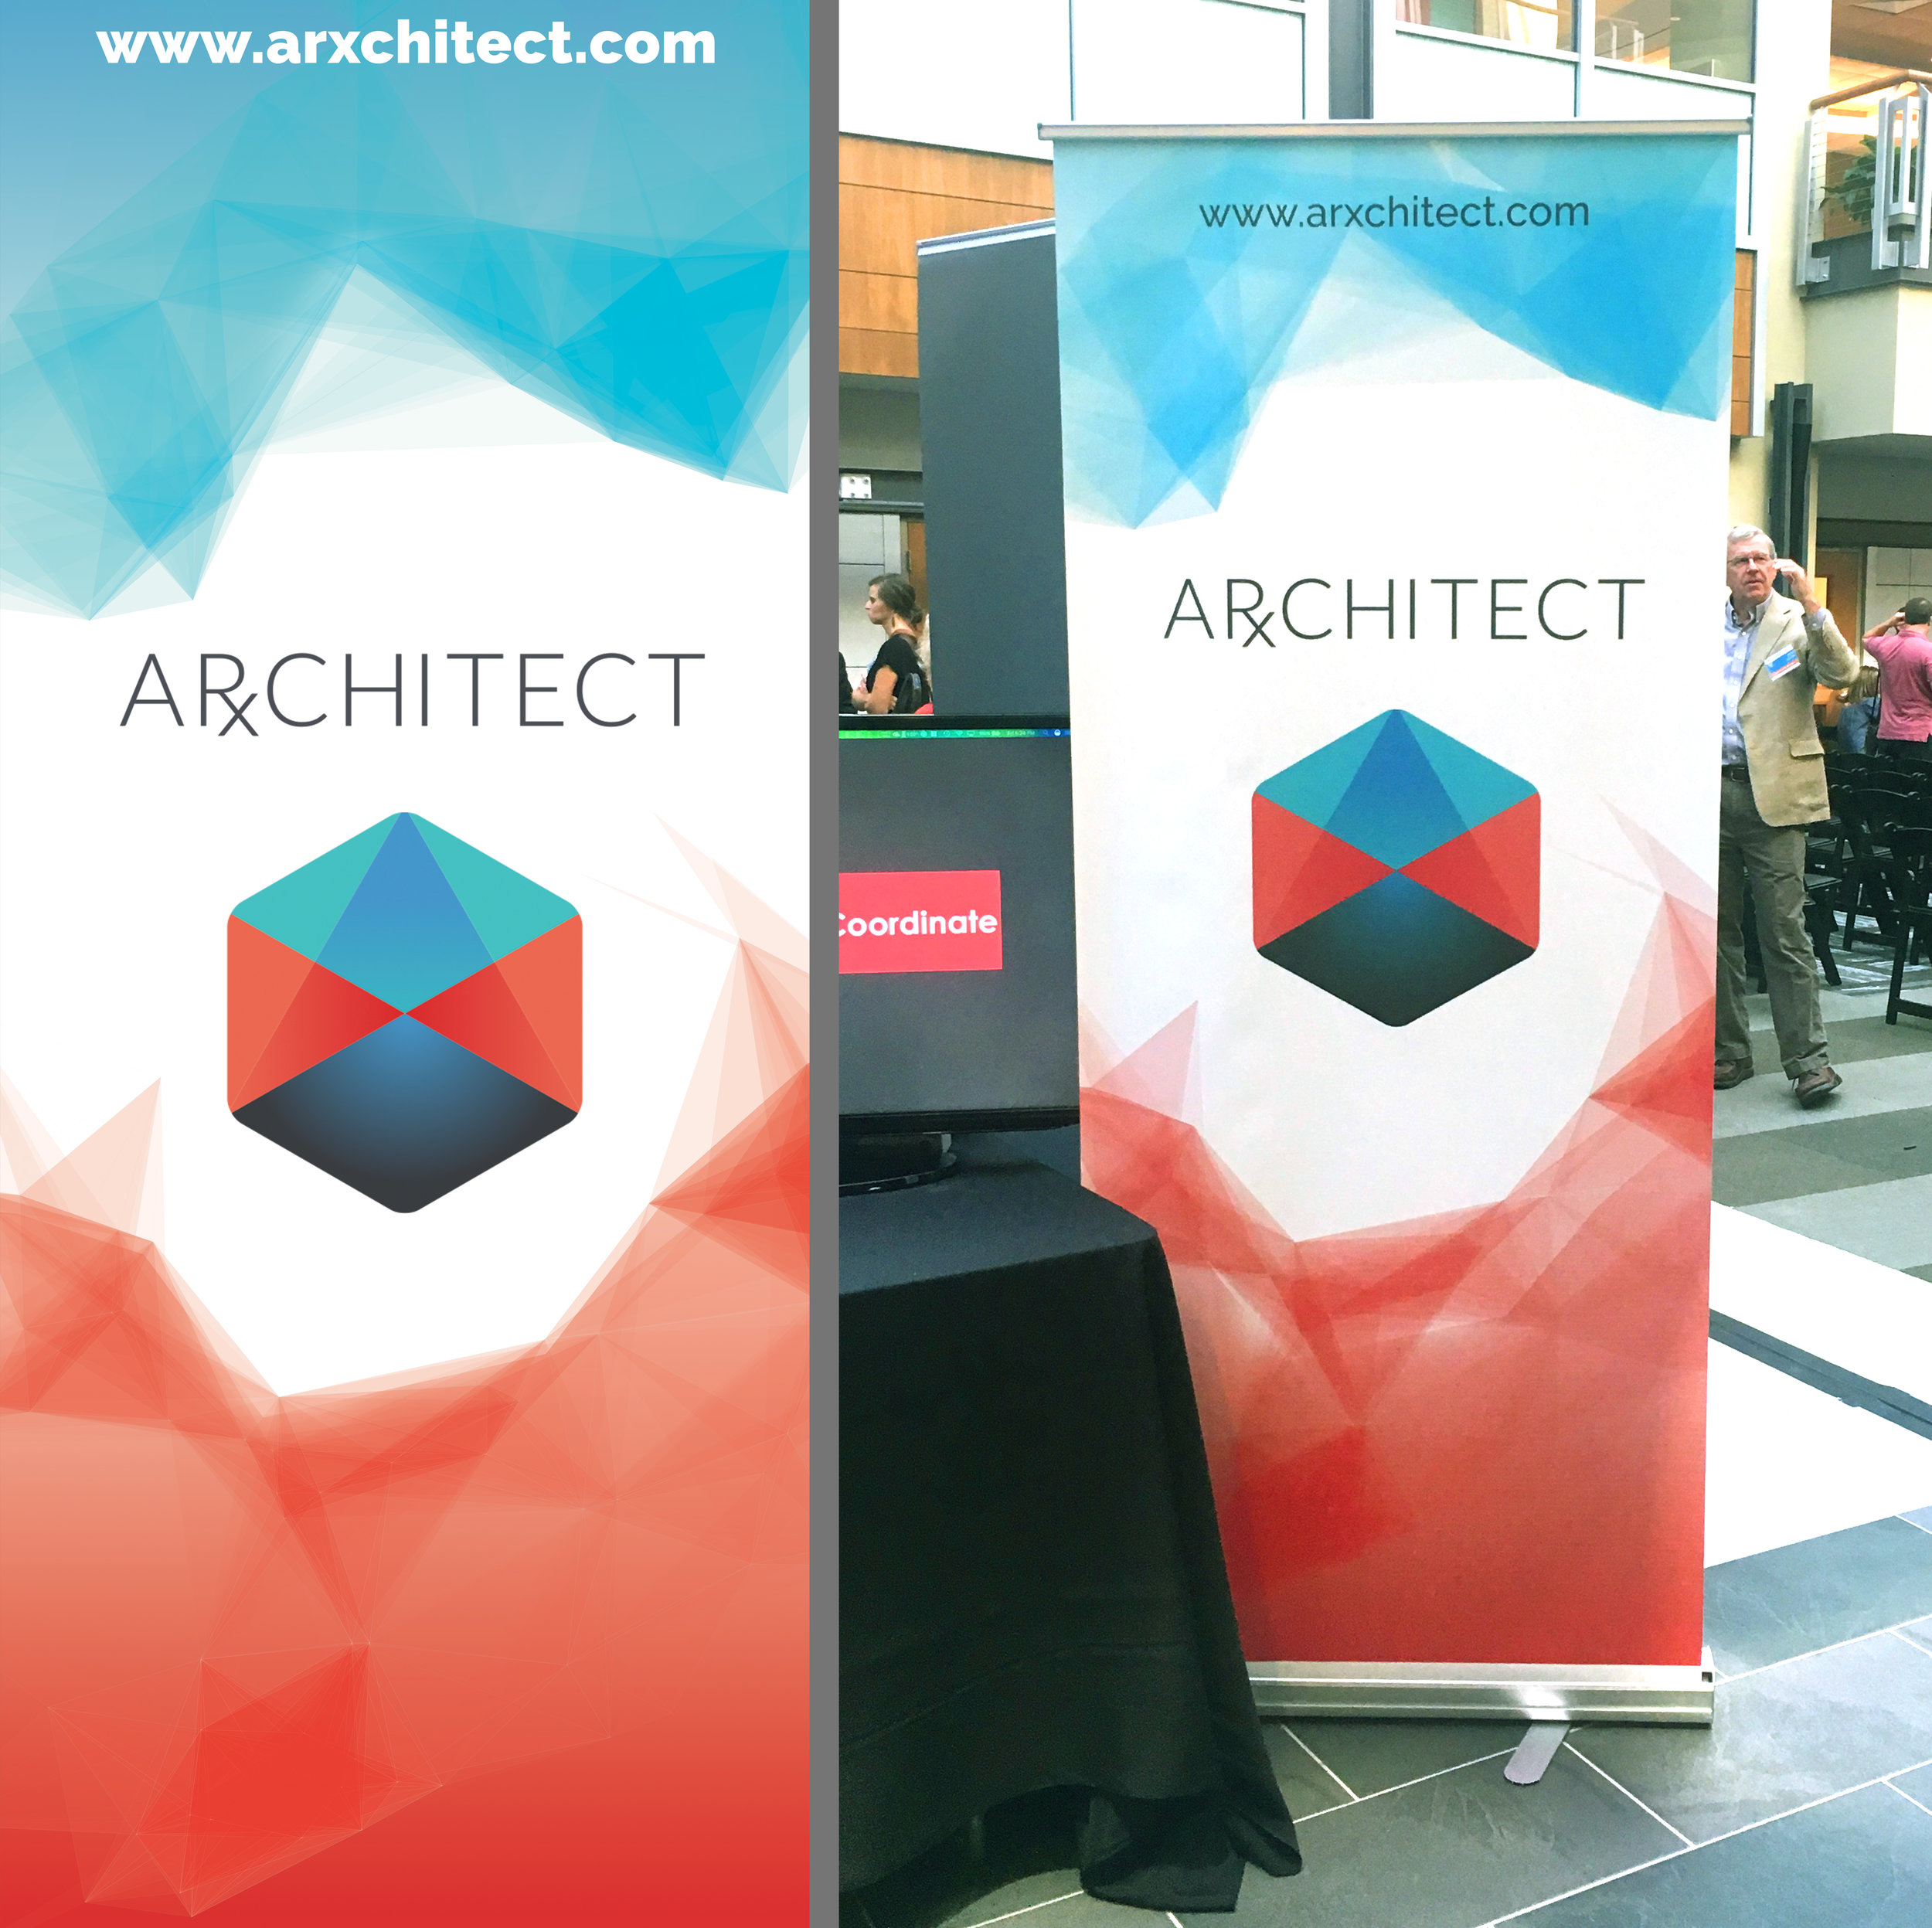 Arxchitect Banner Stand - Demo Day 2017